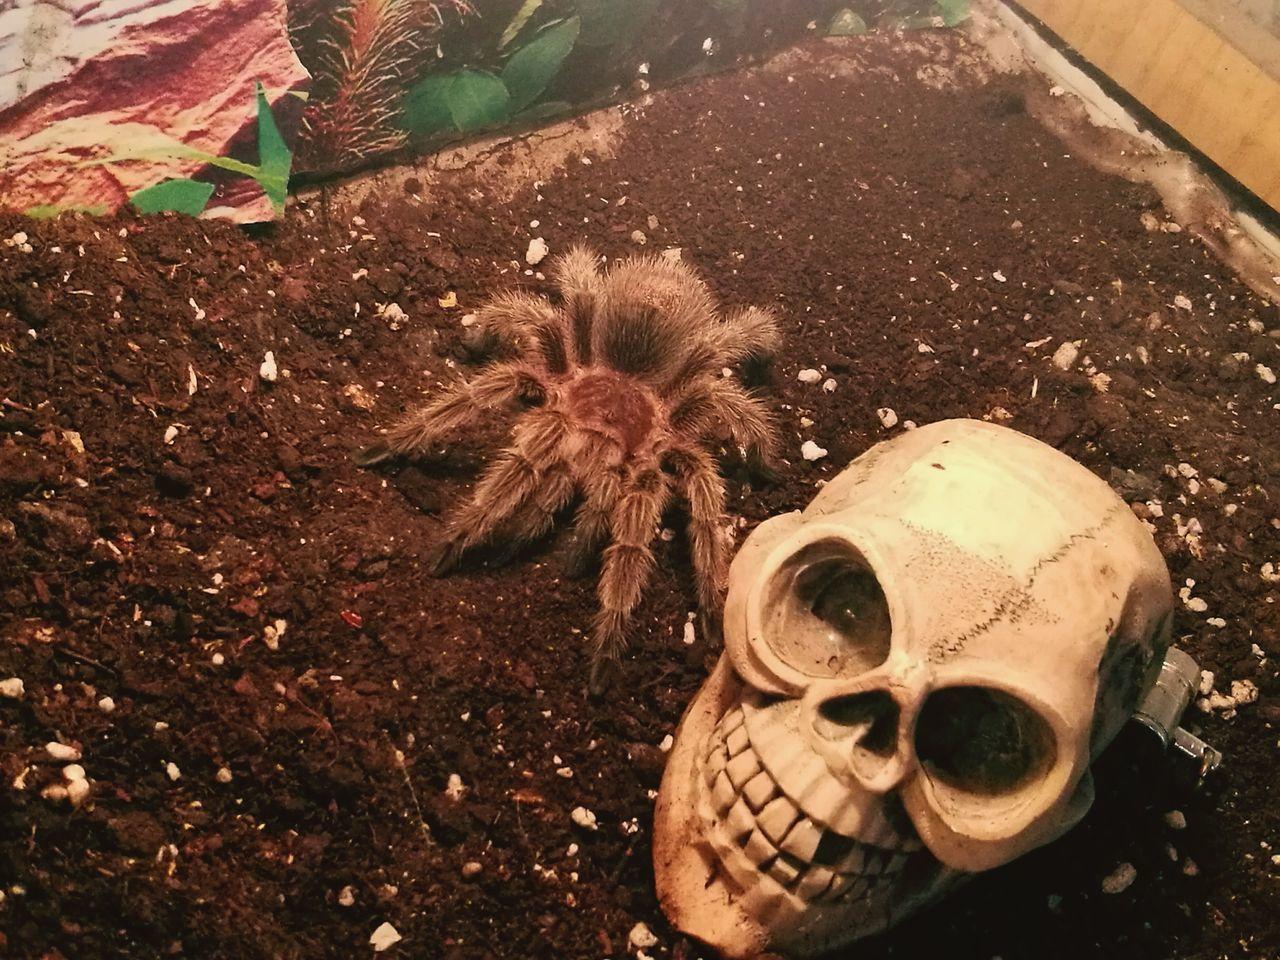 Rossy Gammostrola Tarantula Arañas Spider Rosea Domestic Spider No People Animal Themes Looking At Camera Domestic Animals EyeEm Nature Lover